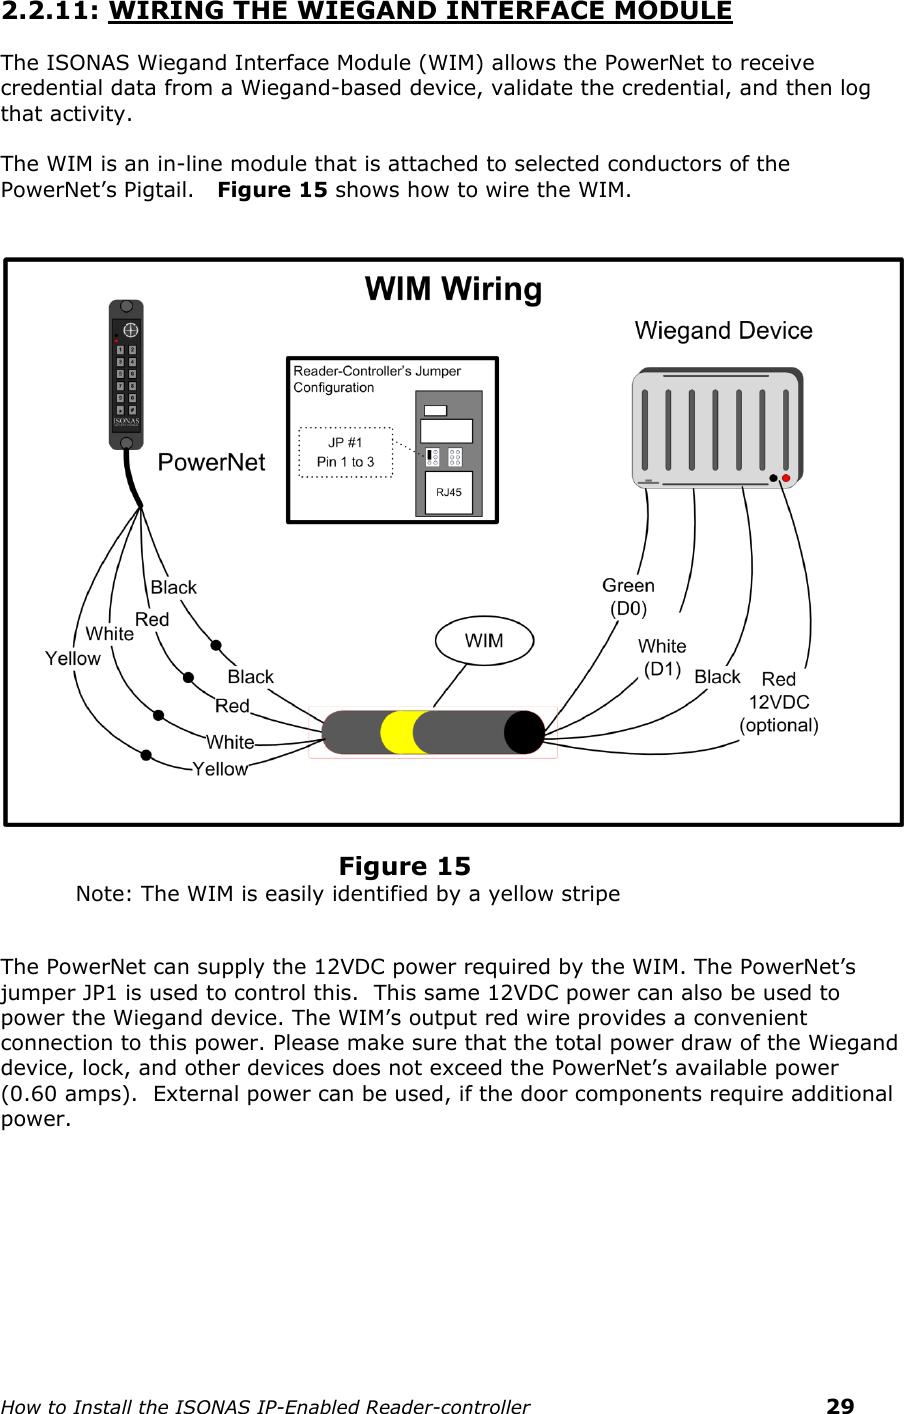 Isonas Wiring Diagram - Wiring Diagram on